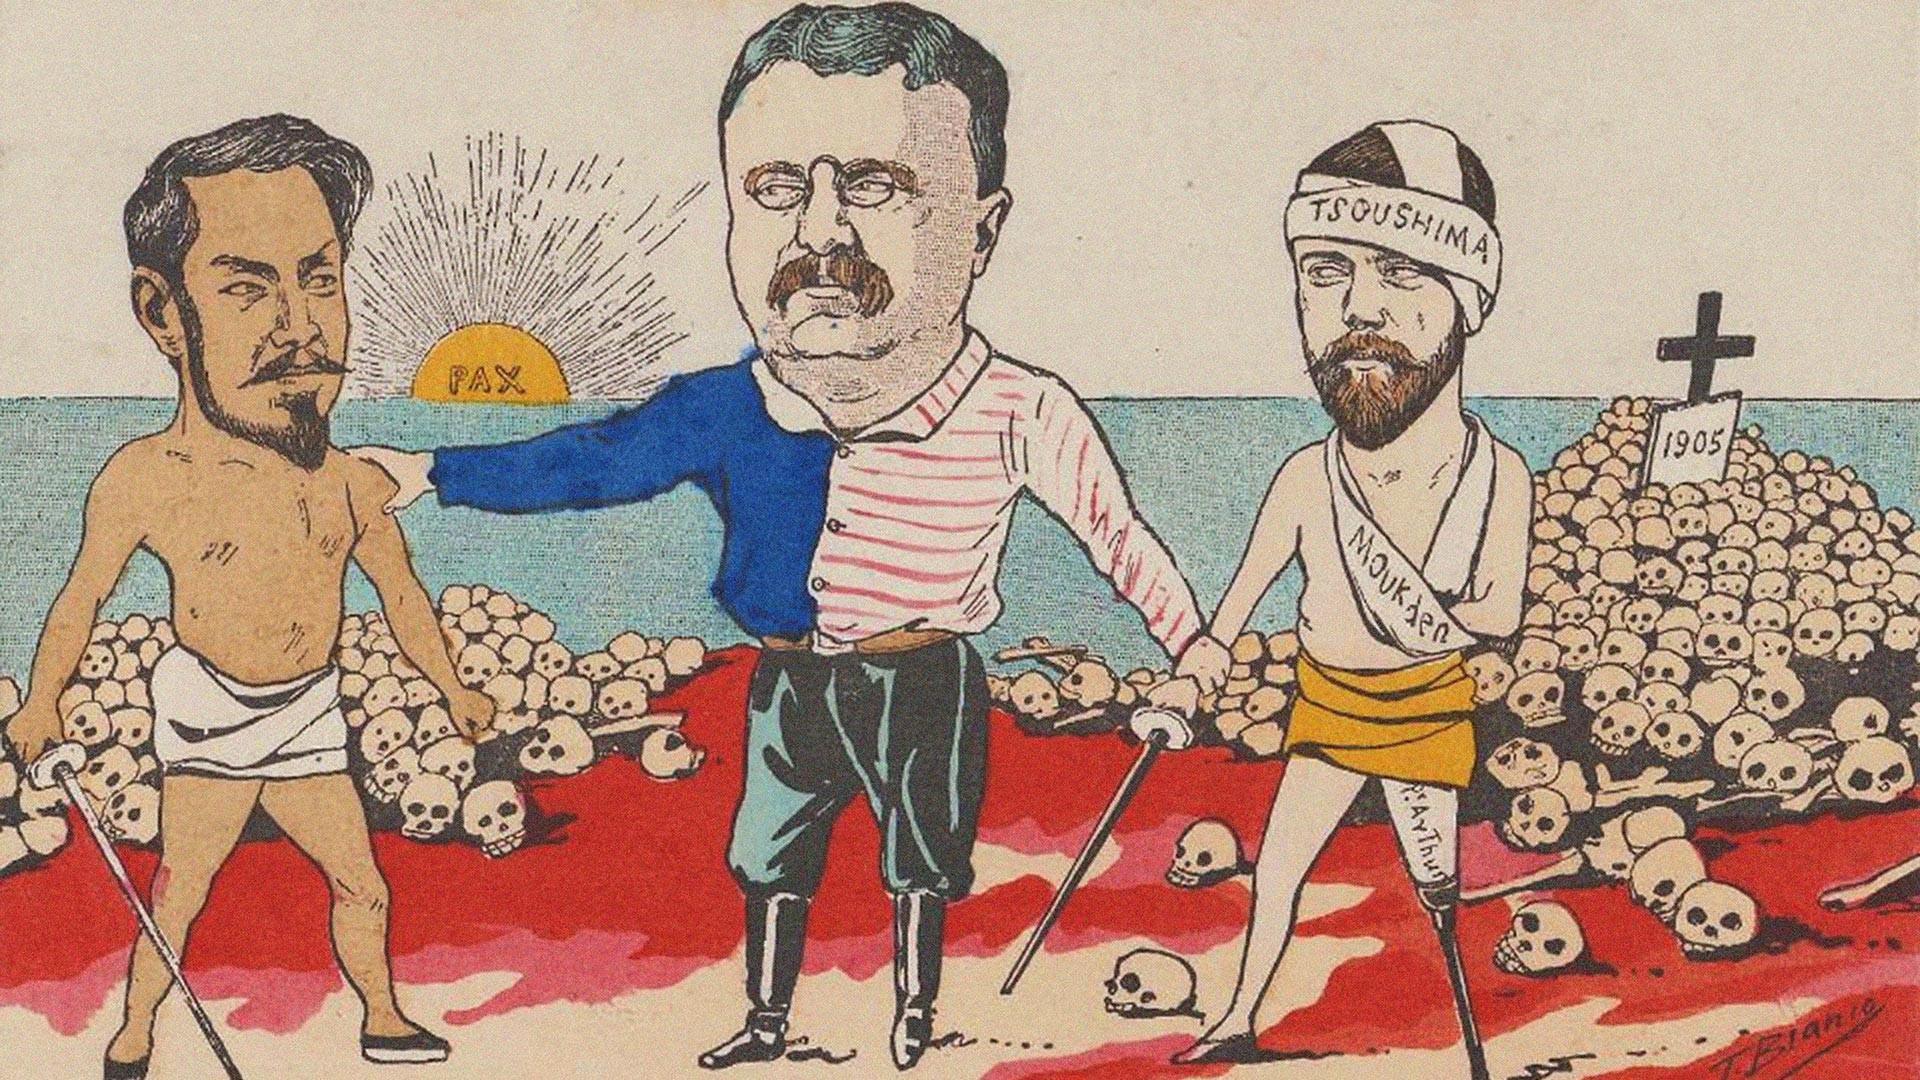 Karikatura portmouthskega miru, 1905